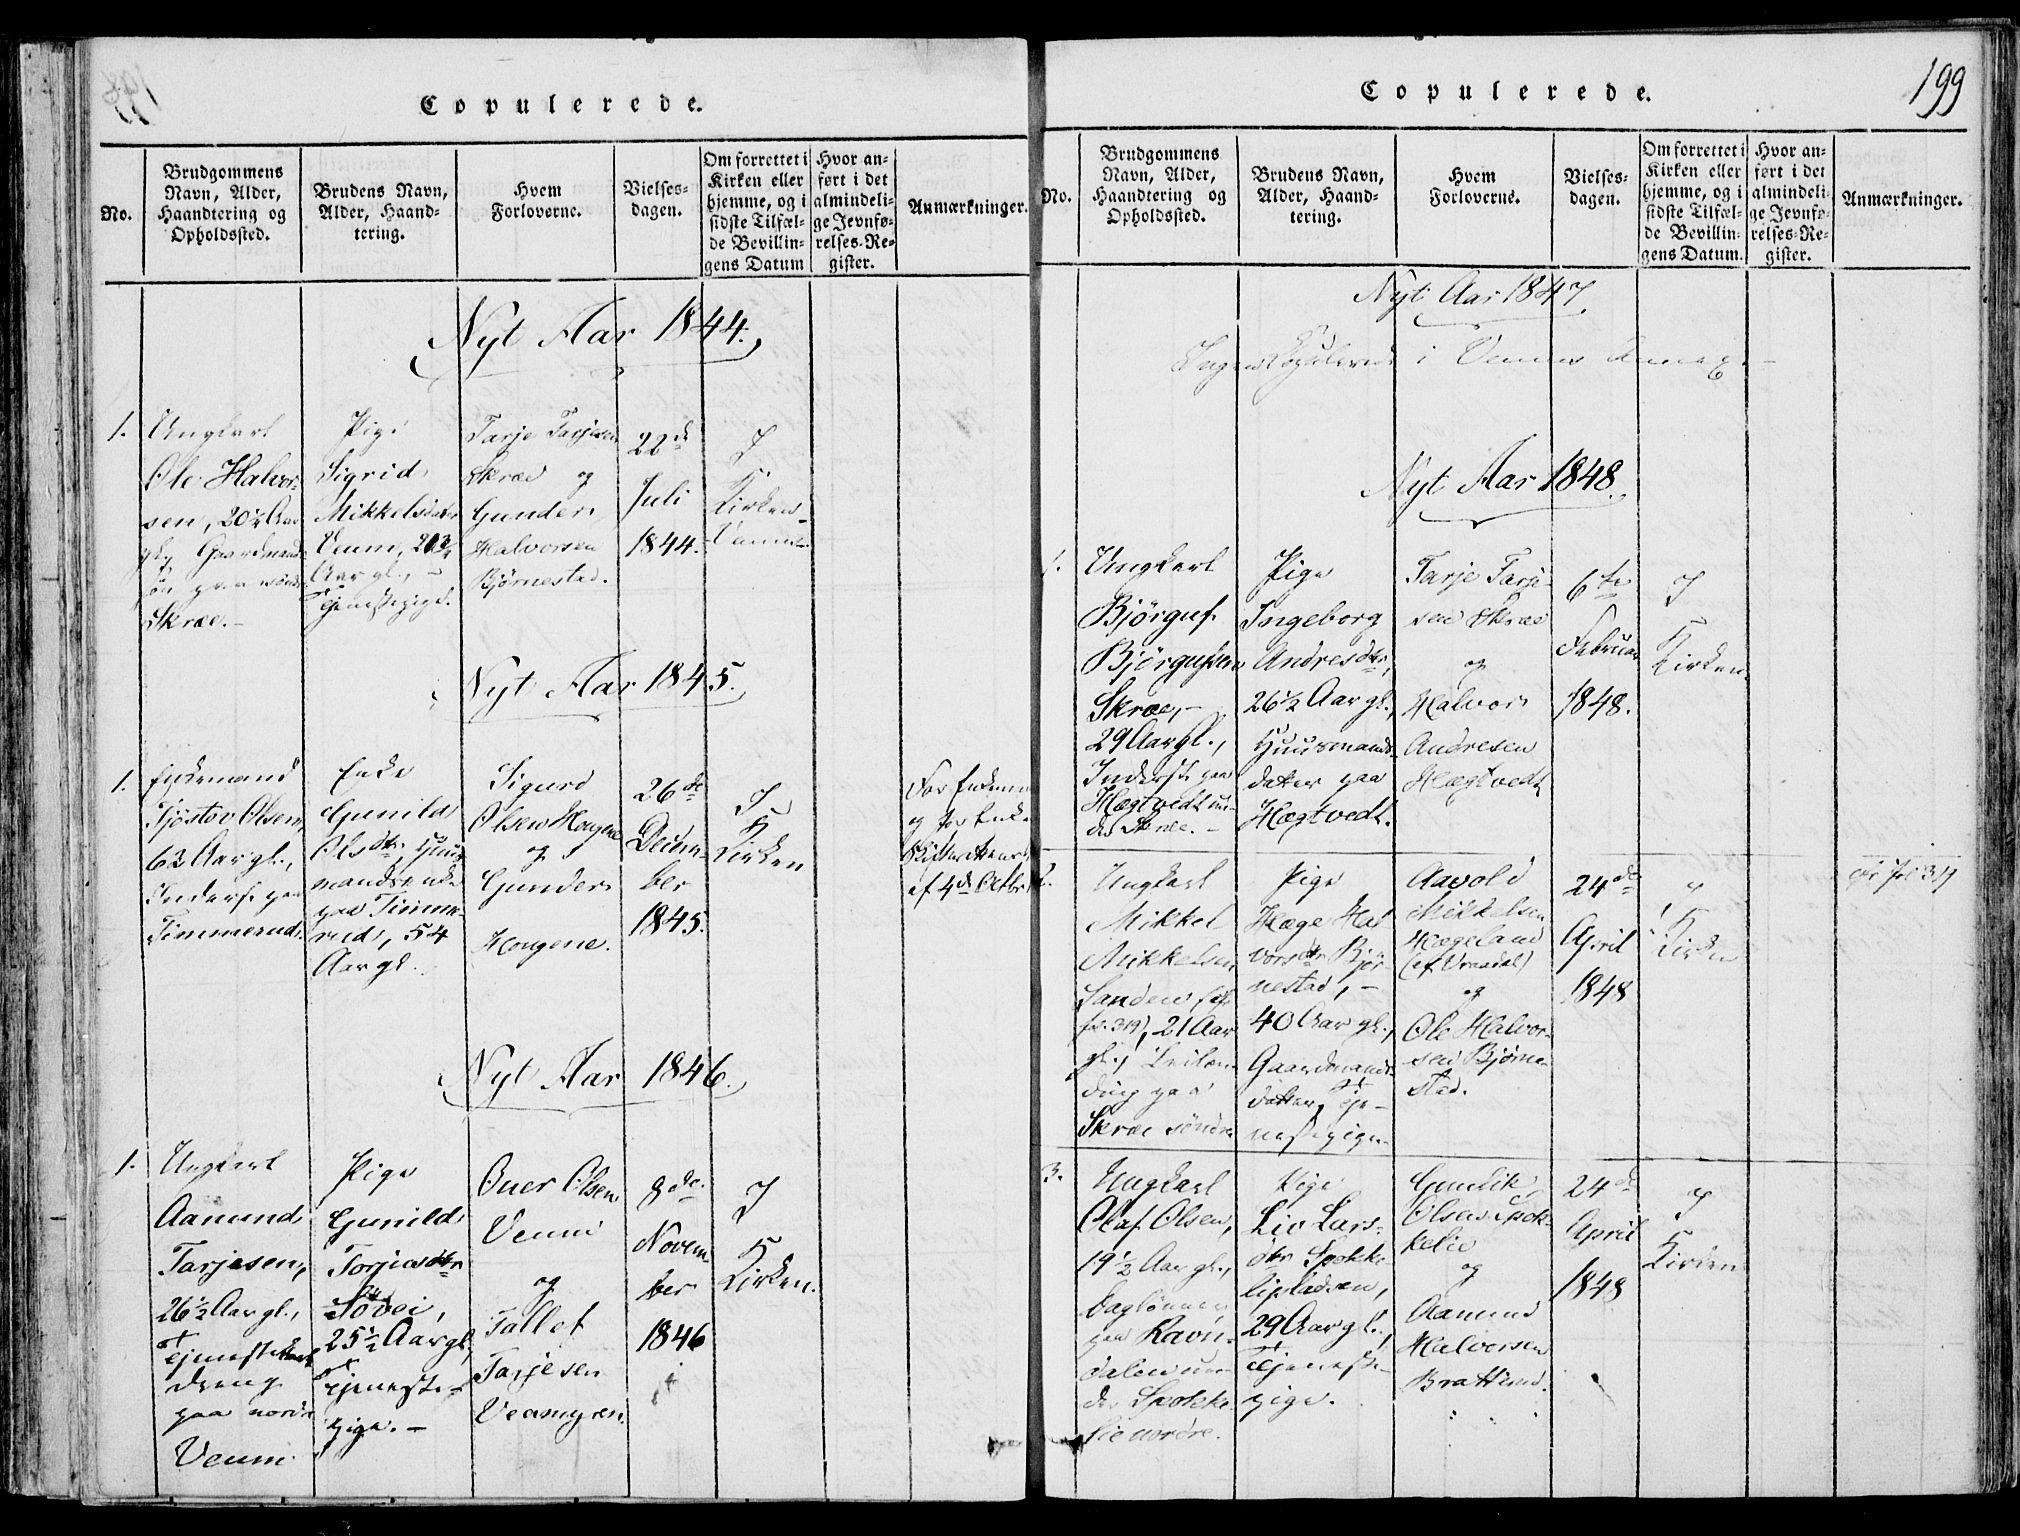 SAKO, Fyresdal kirkebøker, F/Fb/L0001: Ministerialbok nr. II 1, 1815-1854, s. 199